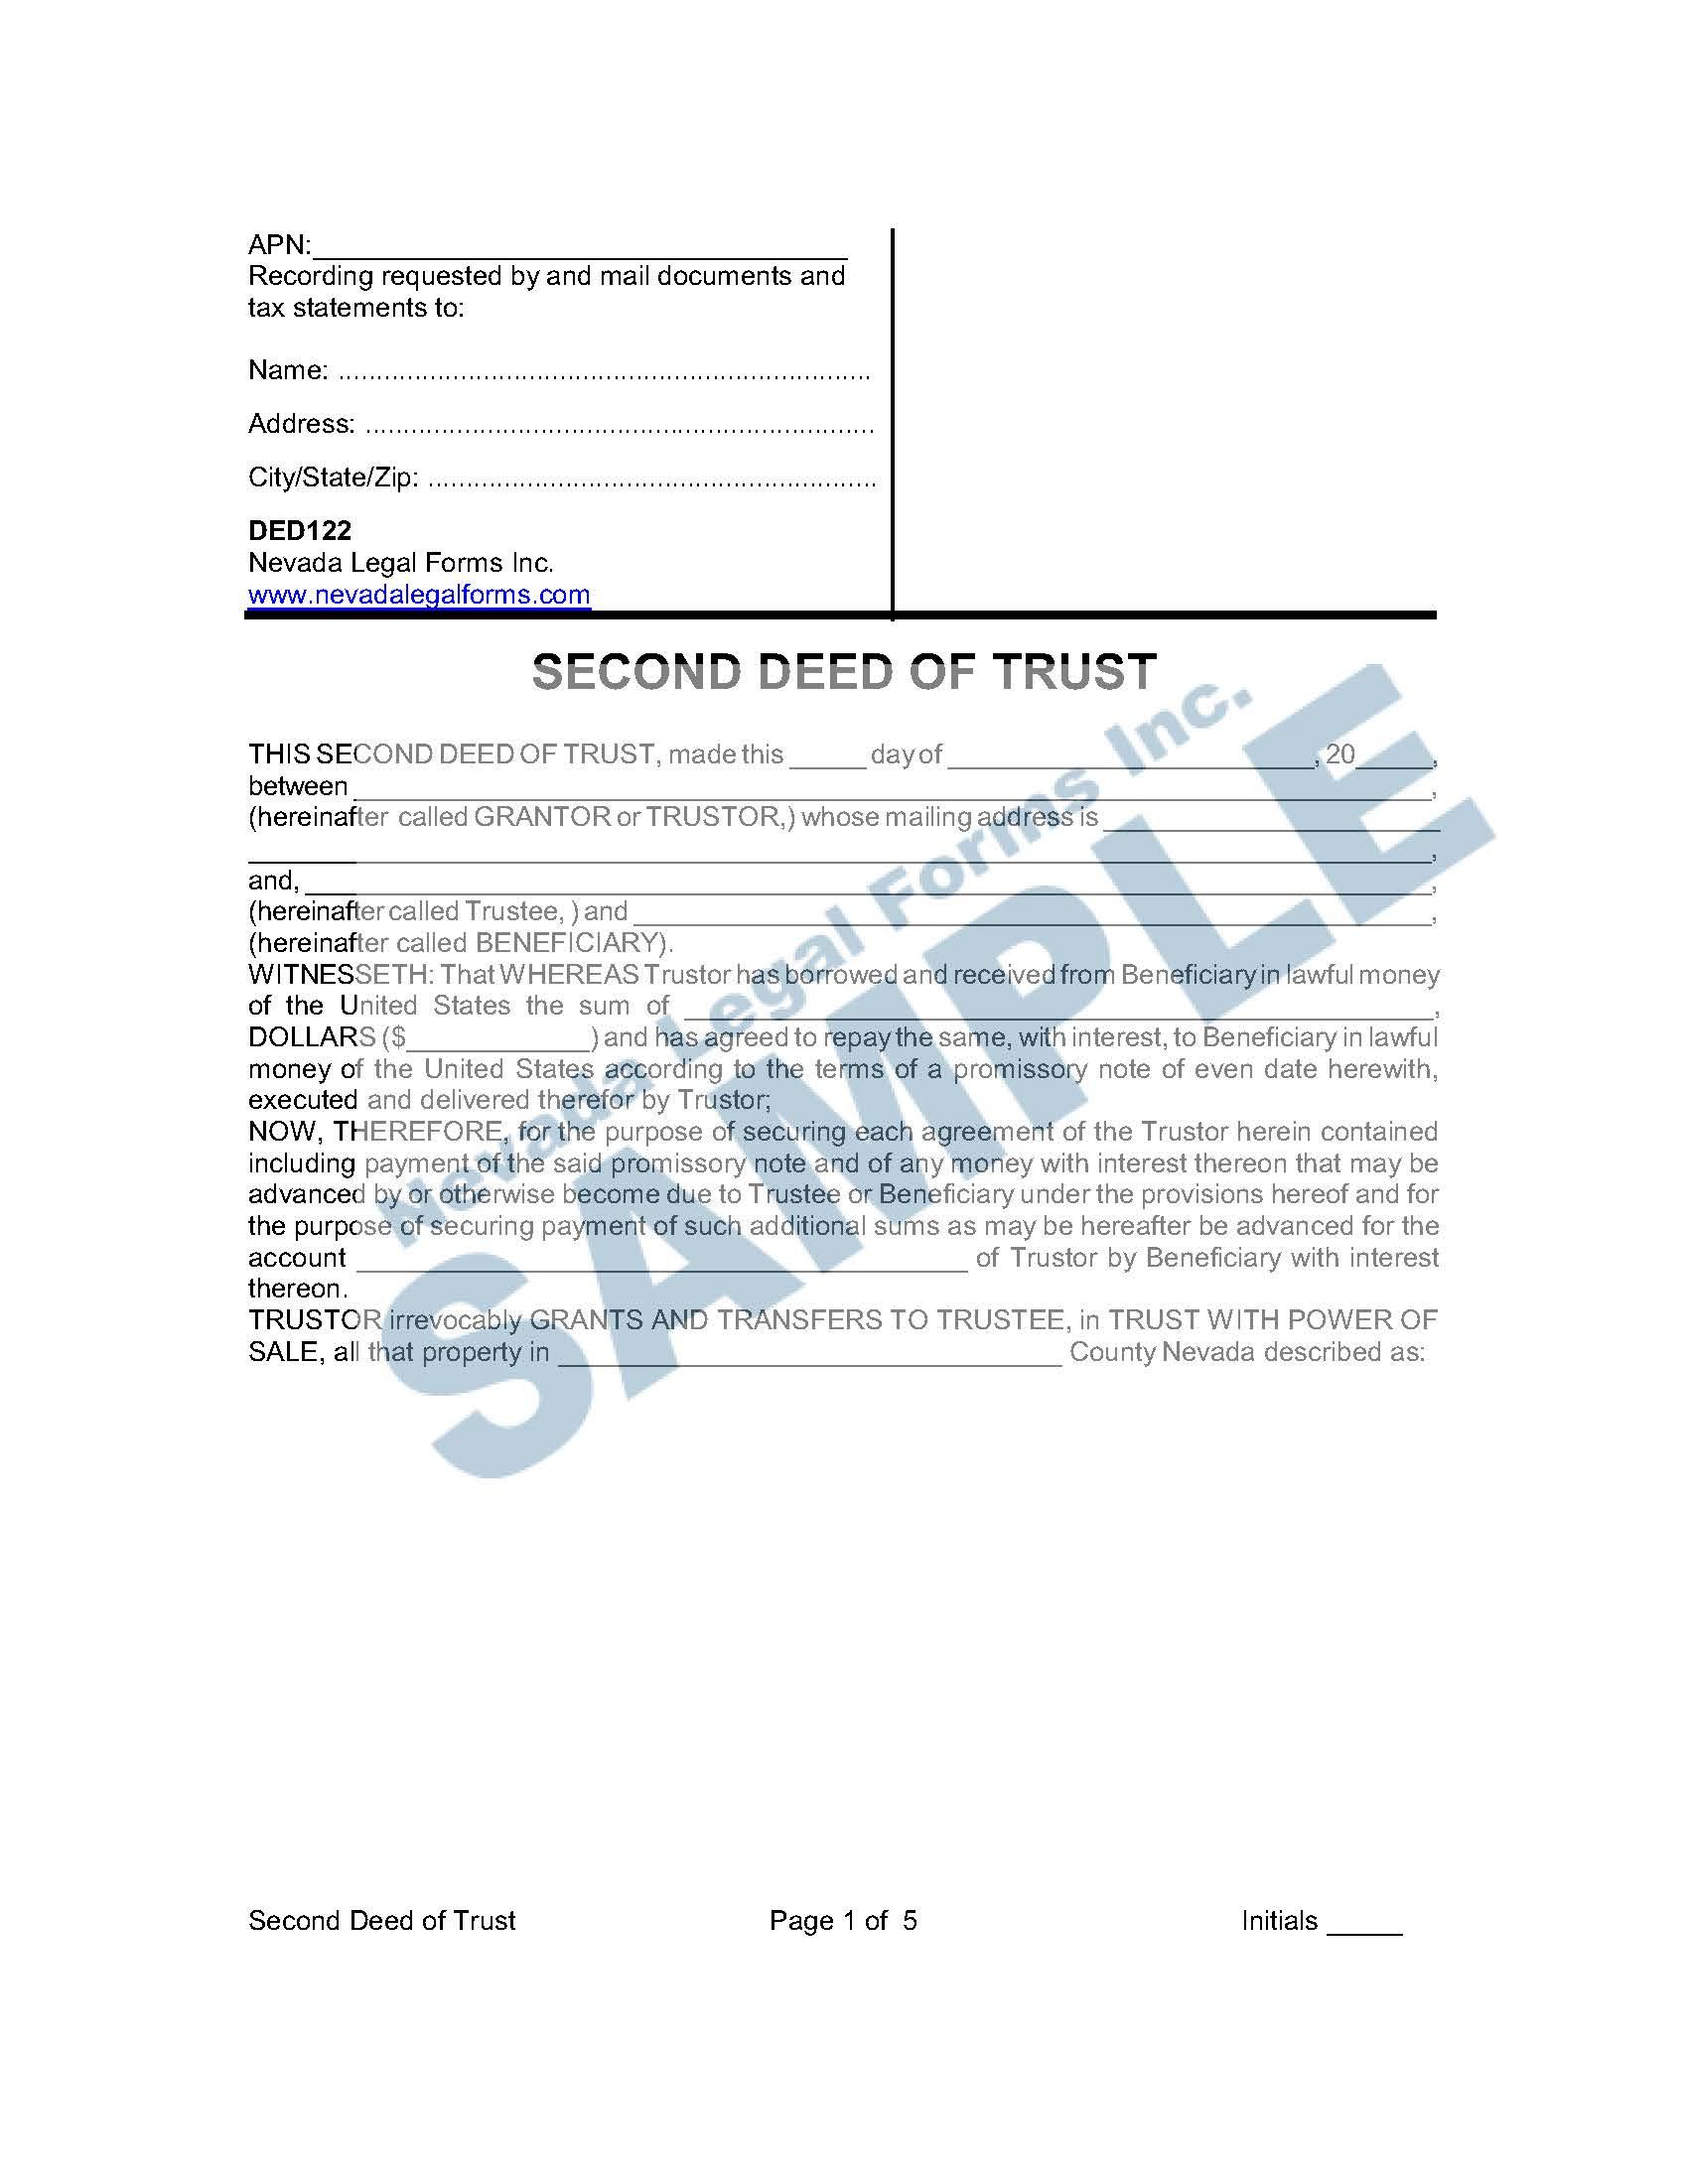 Second Deed Of Trust